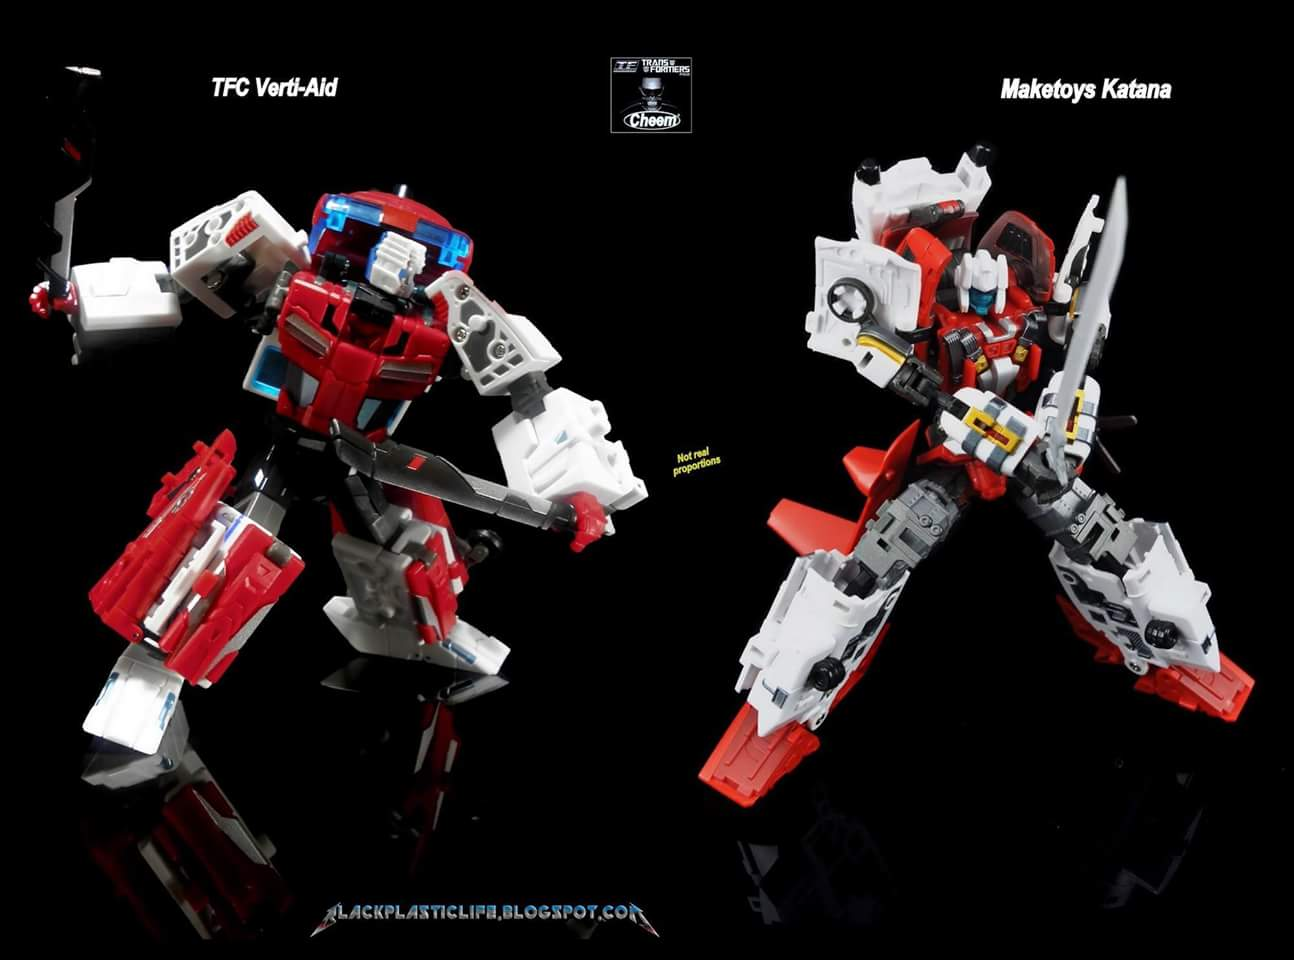 [MakeToys] Produit Tiers - Jouet MTCM-04 Guardia (aka Protectobots - Defensor/Defenso) - Page 3 FBRZeGrf